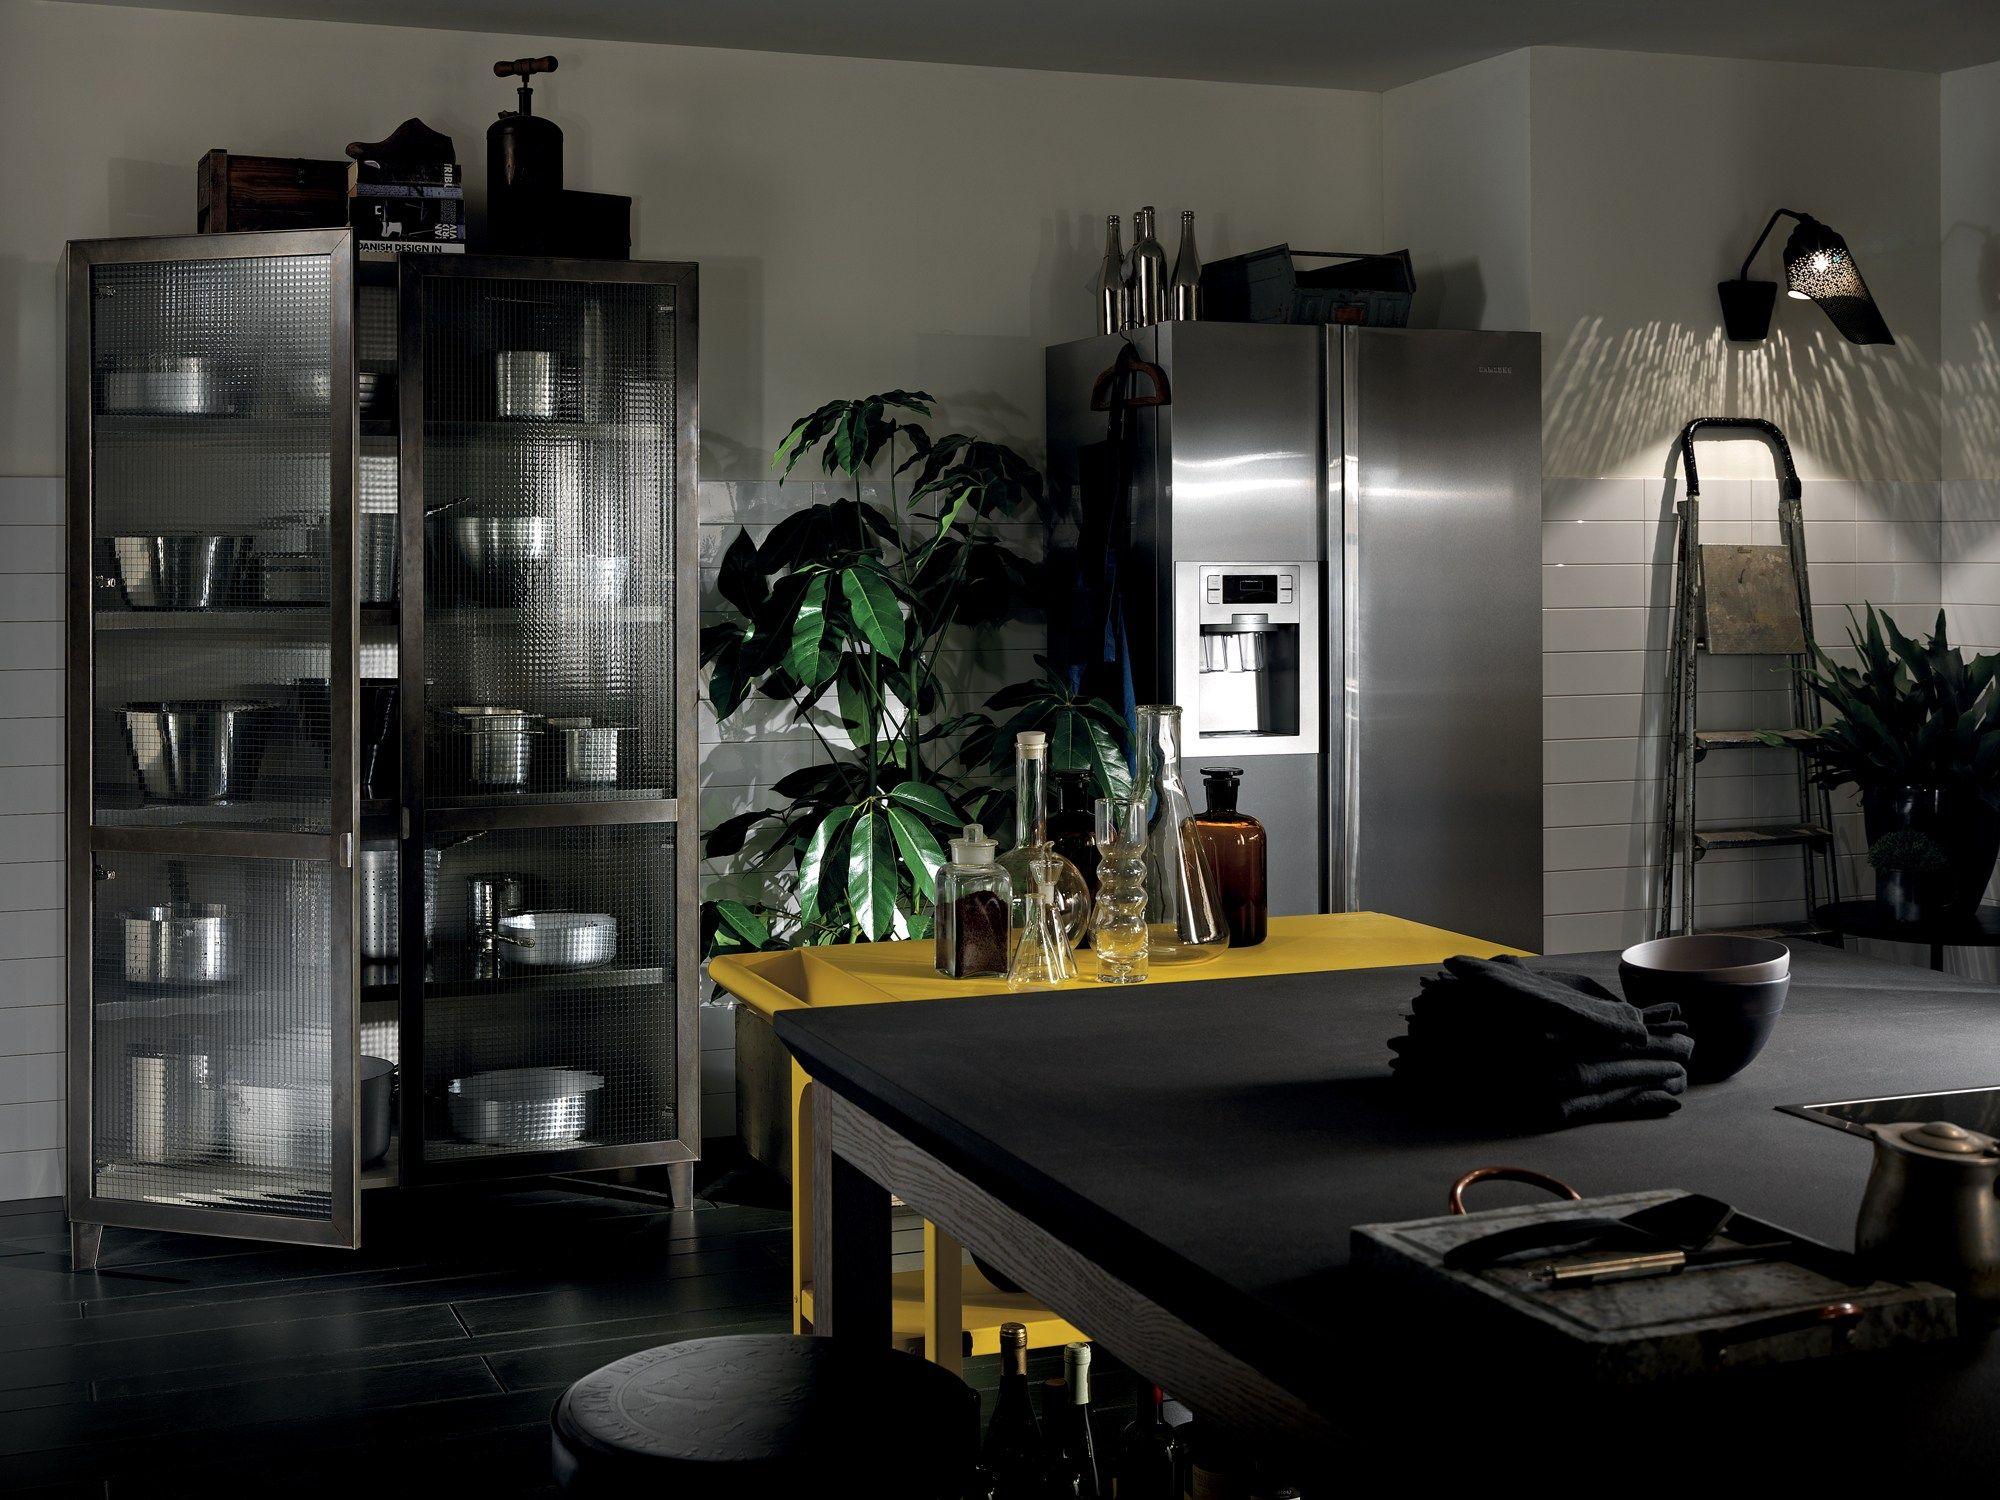 Cucina componibile diesel social kitchen linea scavolini - Cucine scavolini diesel ...